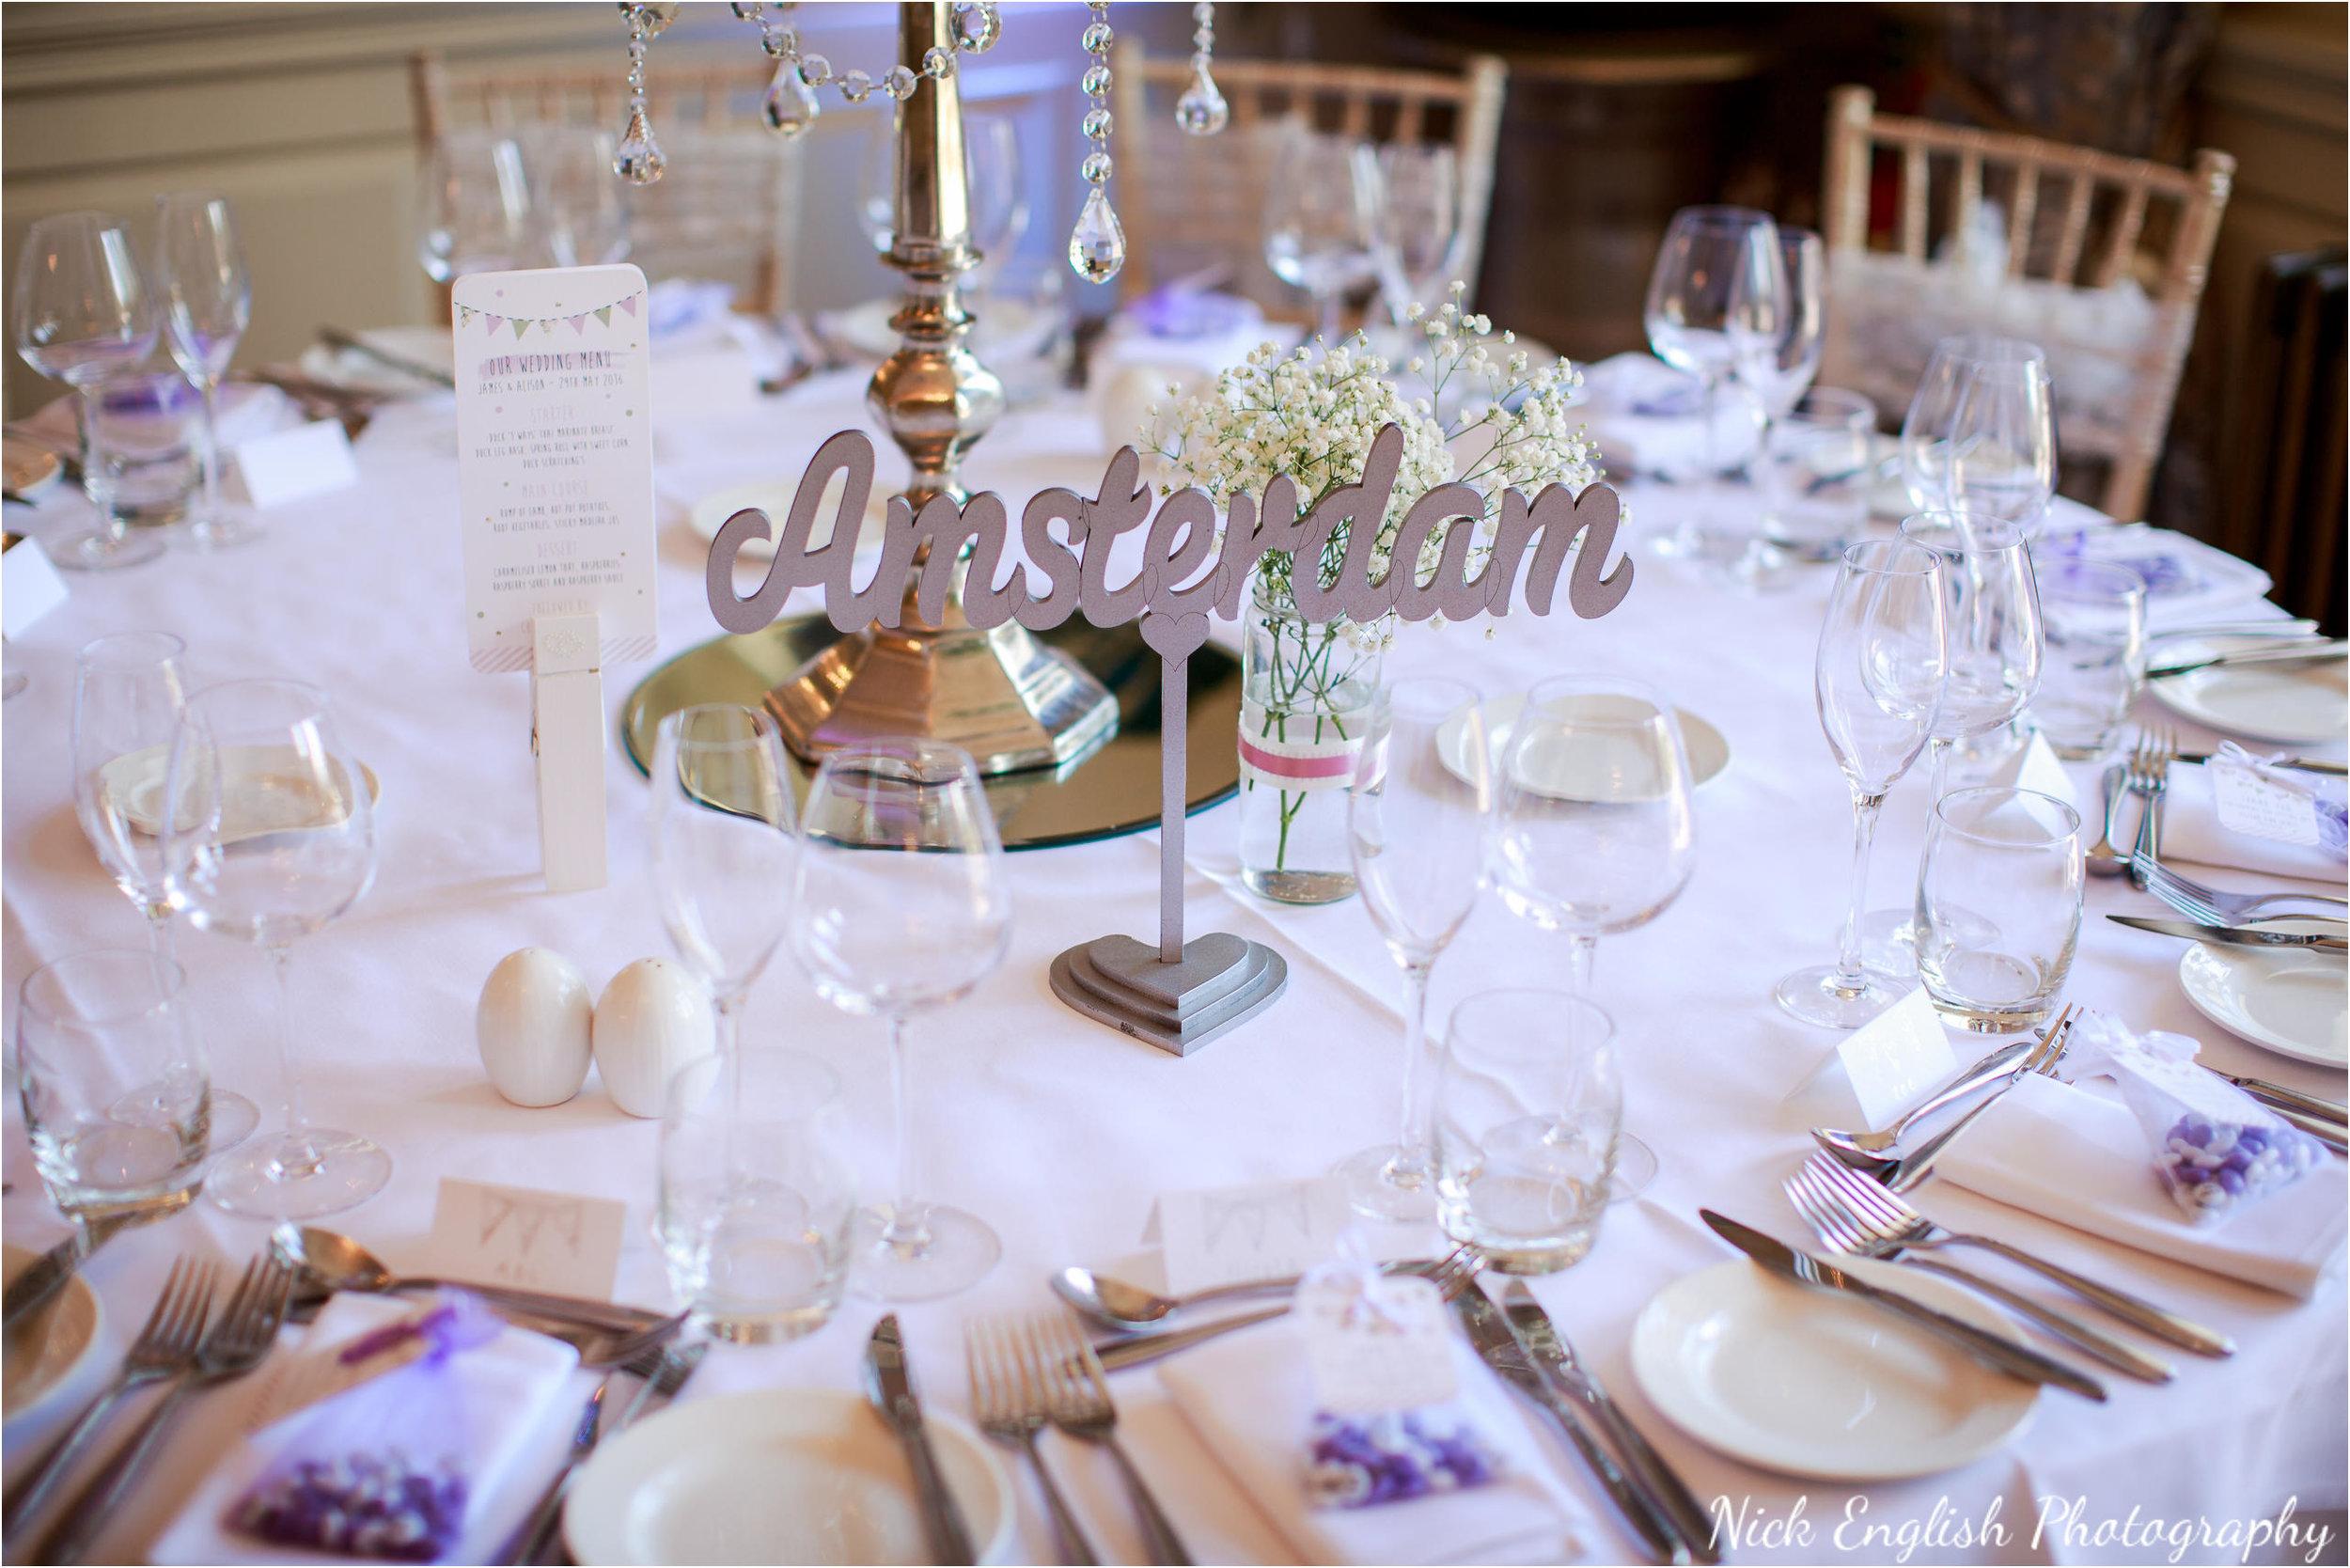 Alison James Wedding Photographs at Eaves Hall West Bradford 149jpg.jpeg